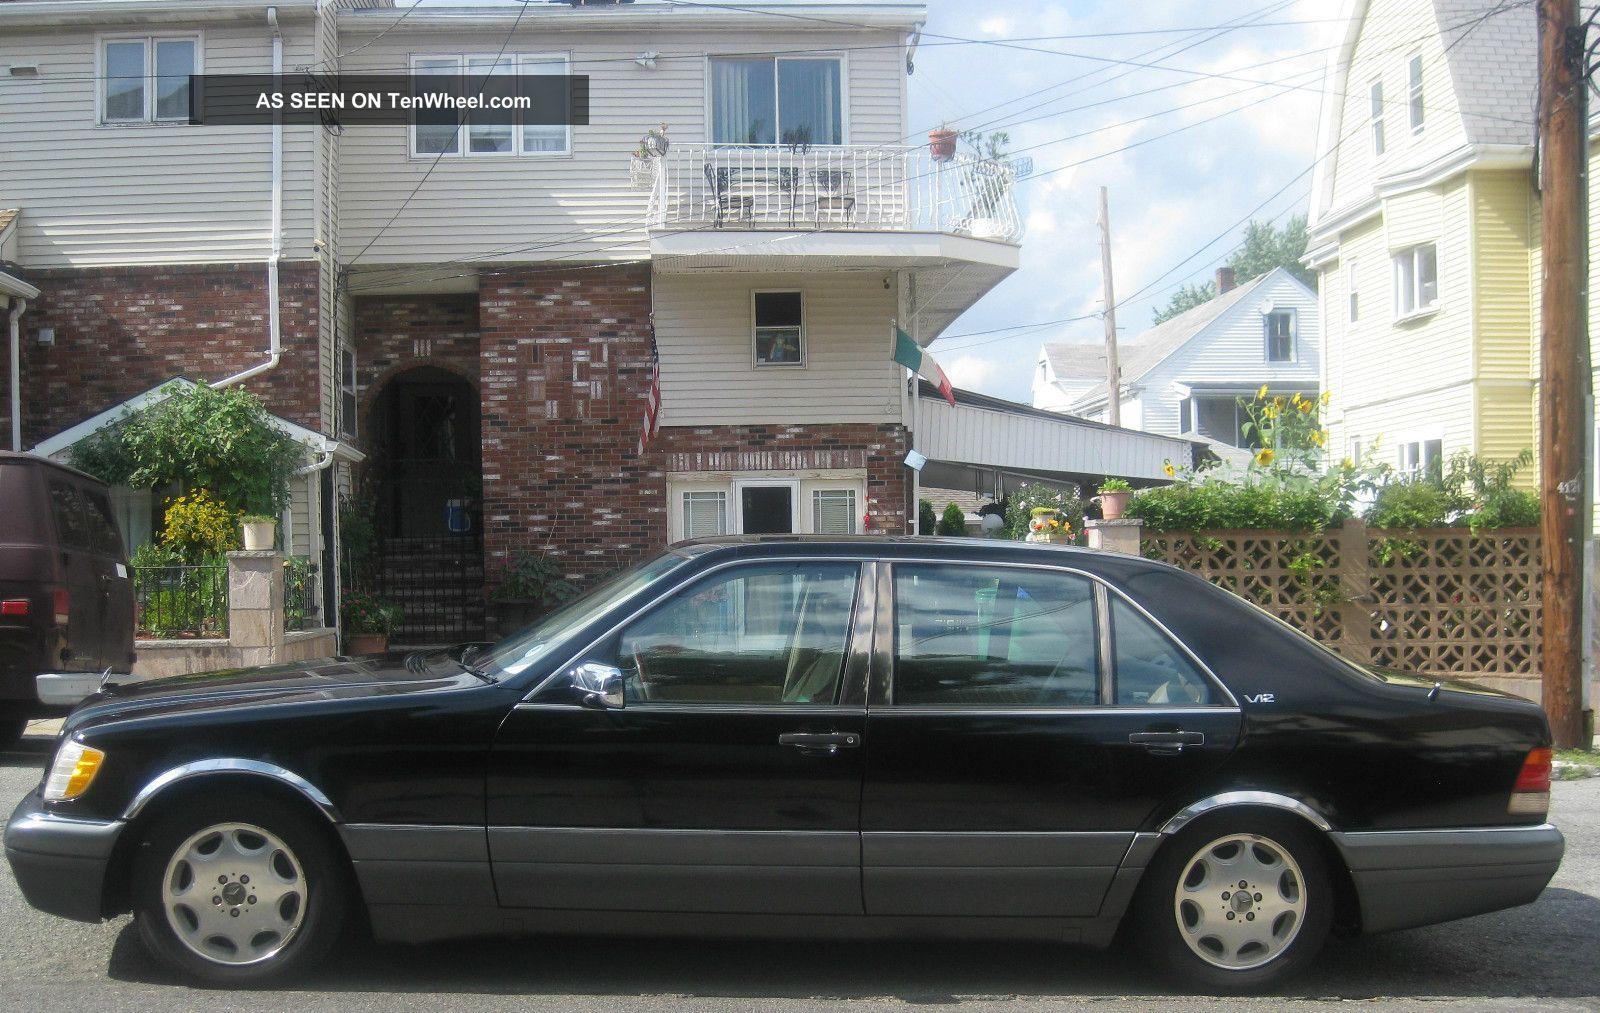 1996 mercedes benz s500 black for Mercedes benz s500 1996